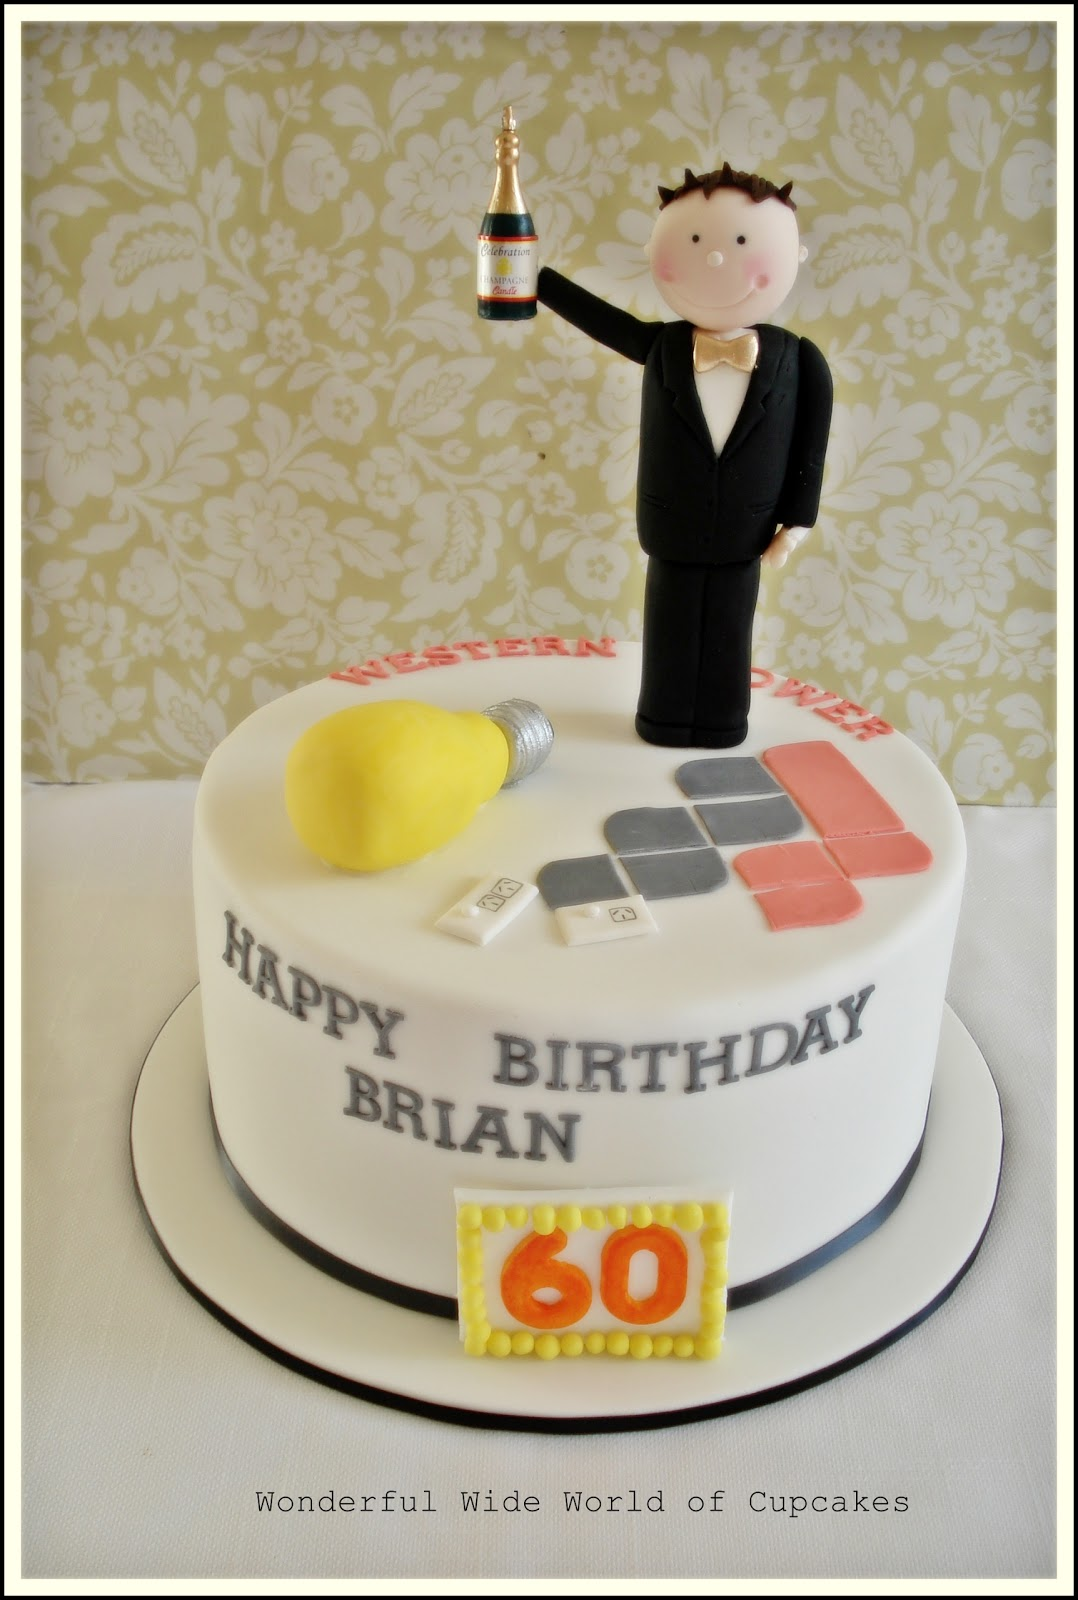 Wonderful World Of Cupcakes 60th Birthday Cake